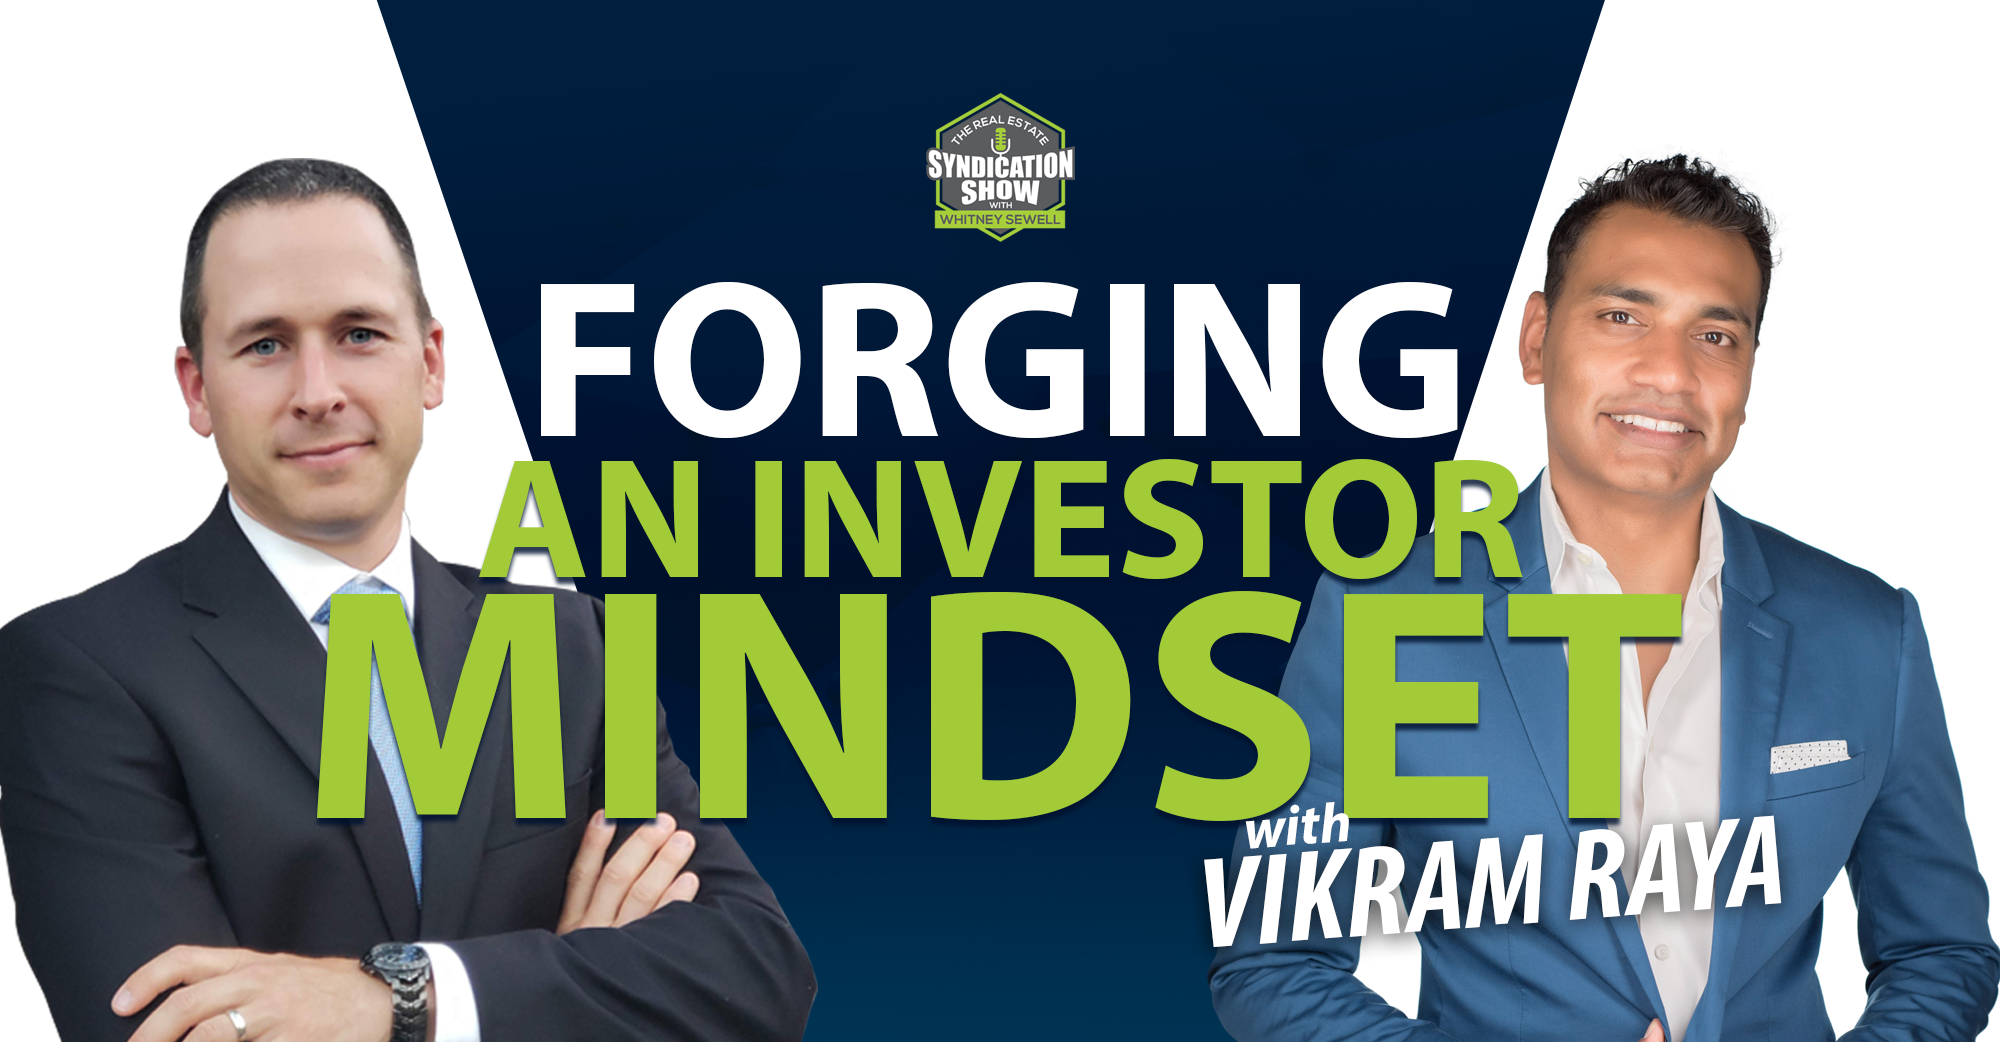 Forging an Investor Mindset with Vikram Raya